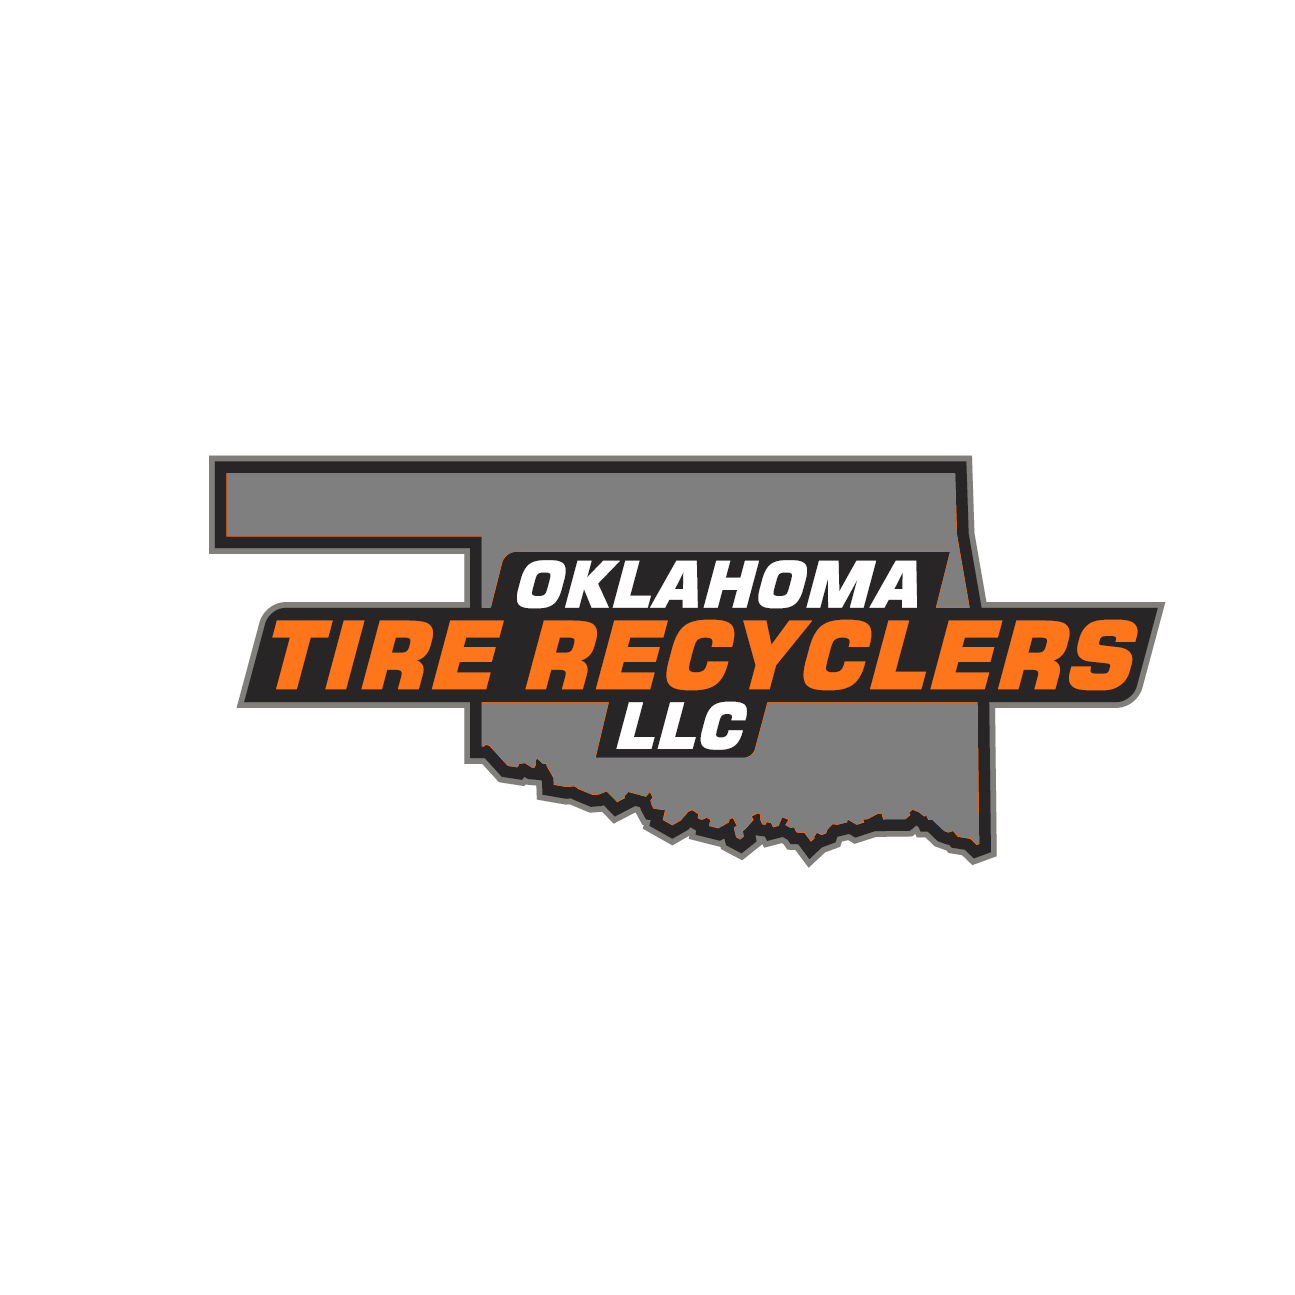 Oklahoma Tire Recyclers